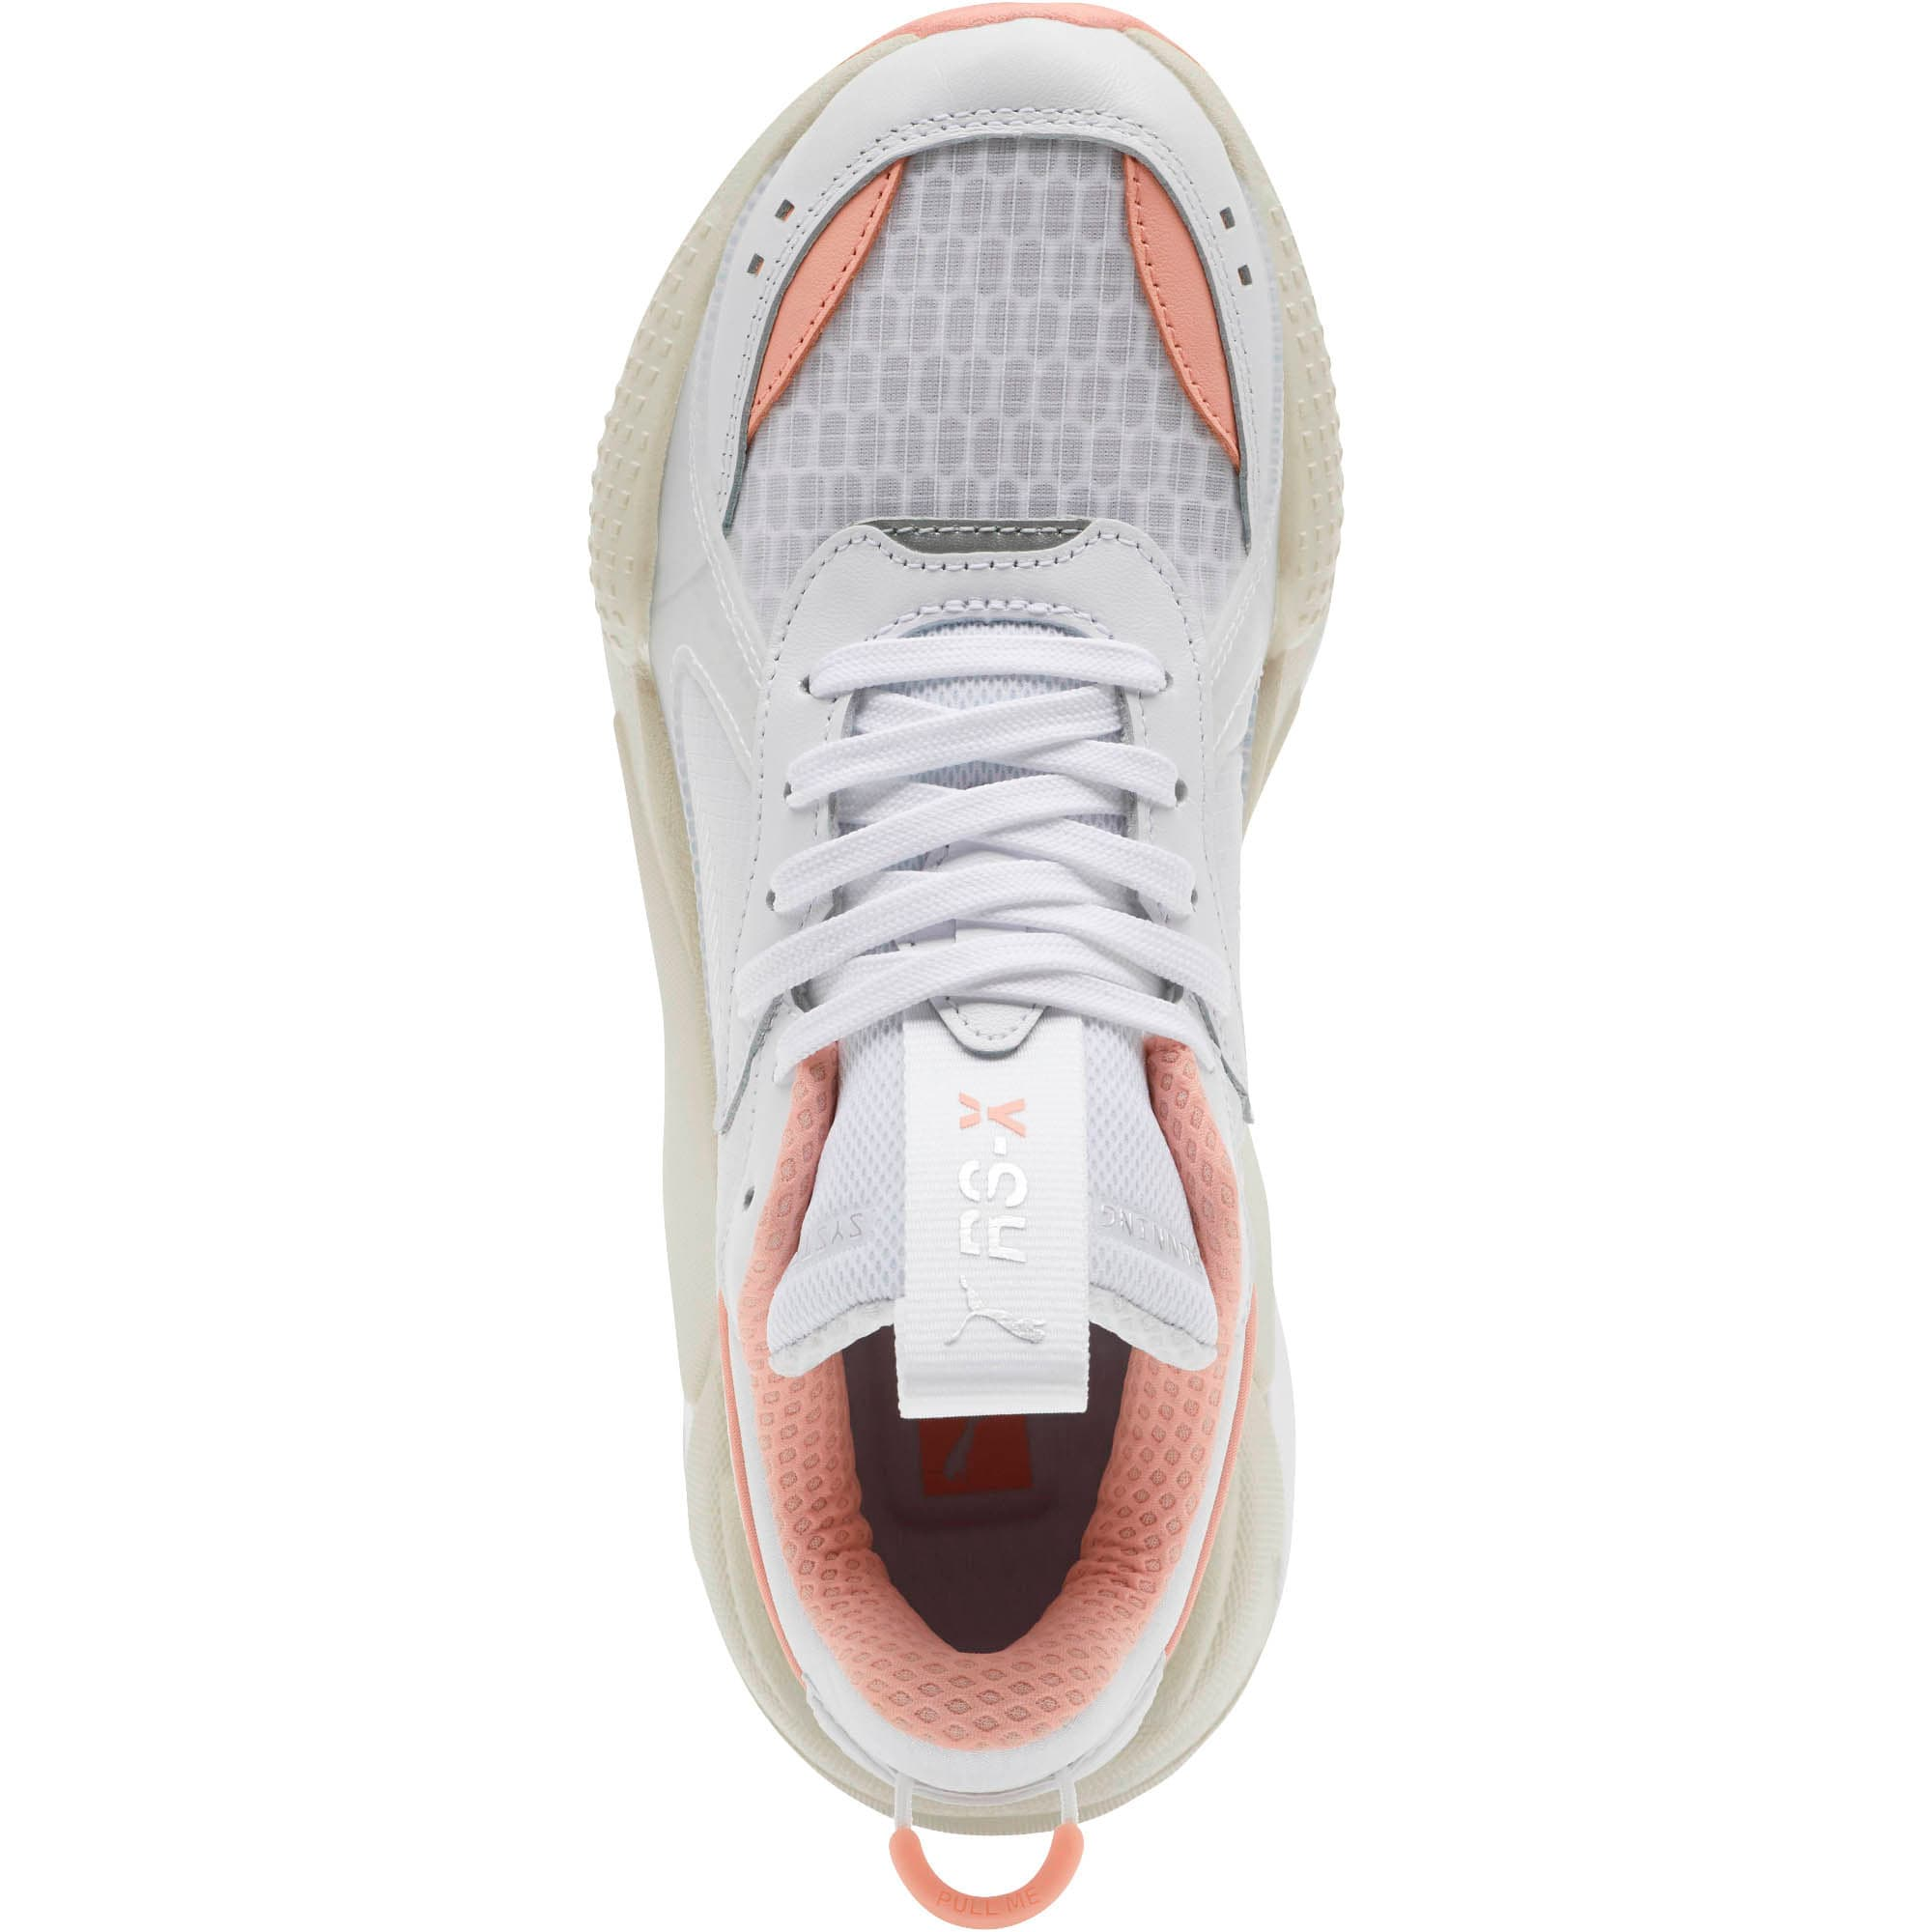 Thumbnail 5 of RS-X Tech Women's Sneakers, Puma White-Peach Bud, medium